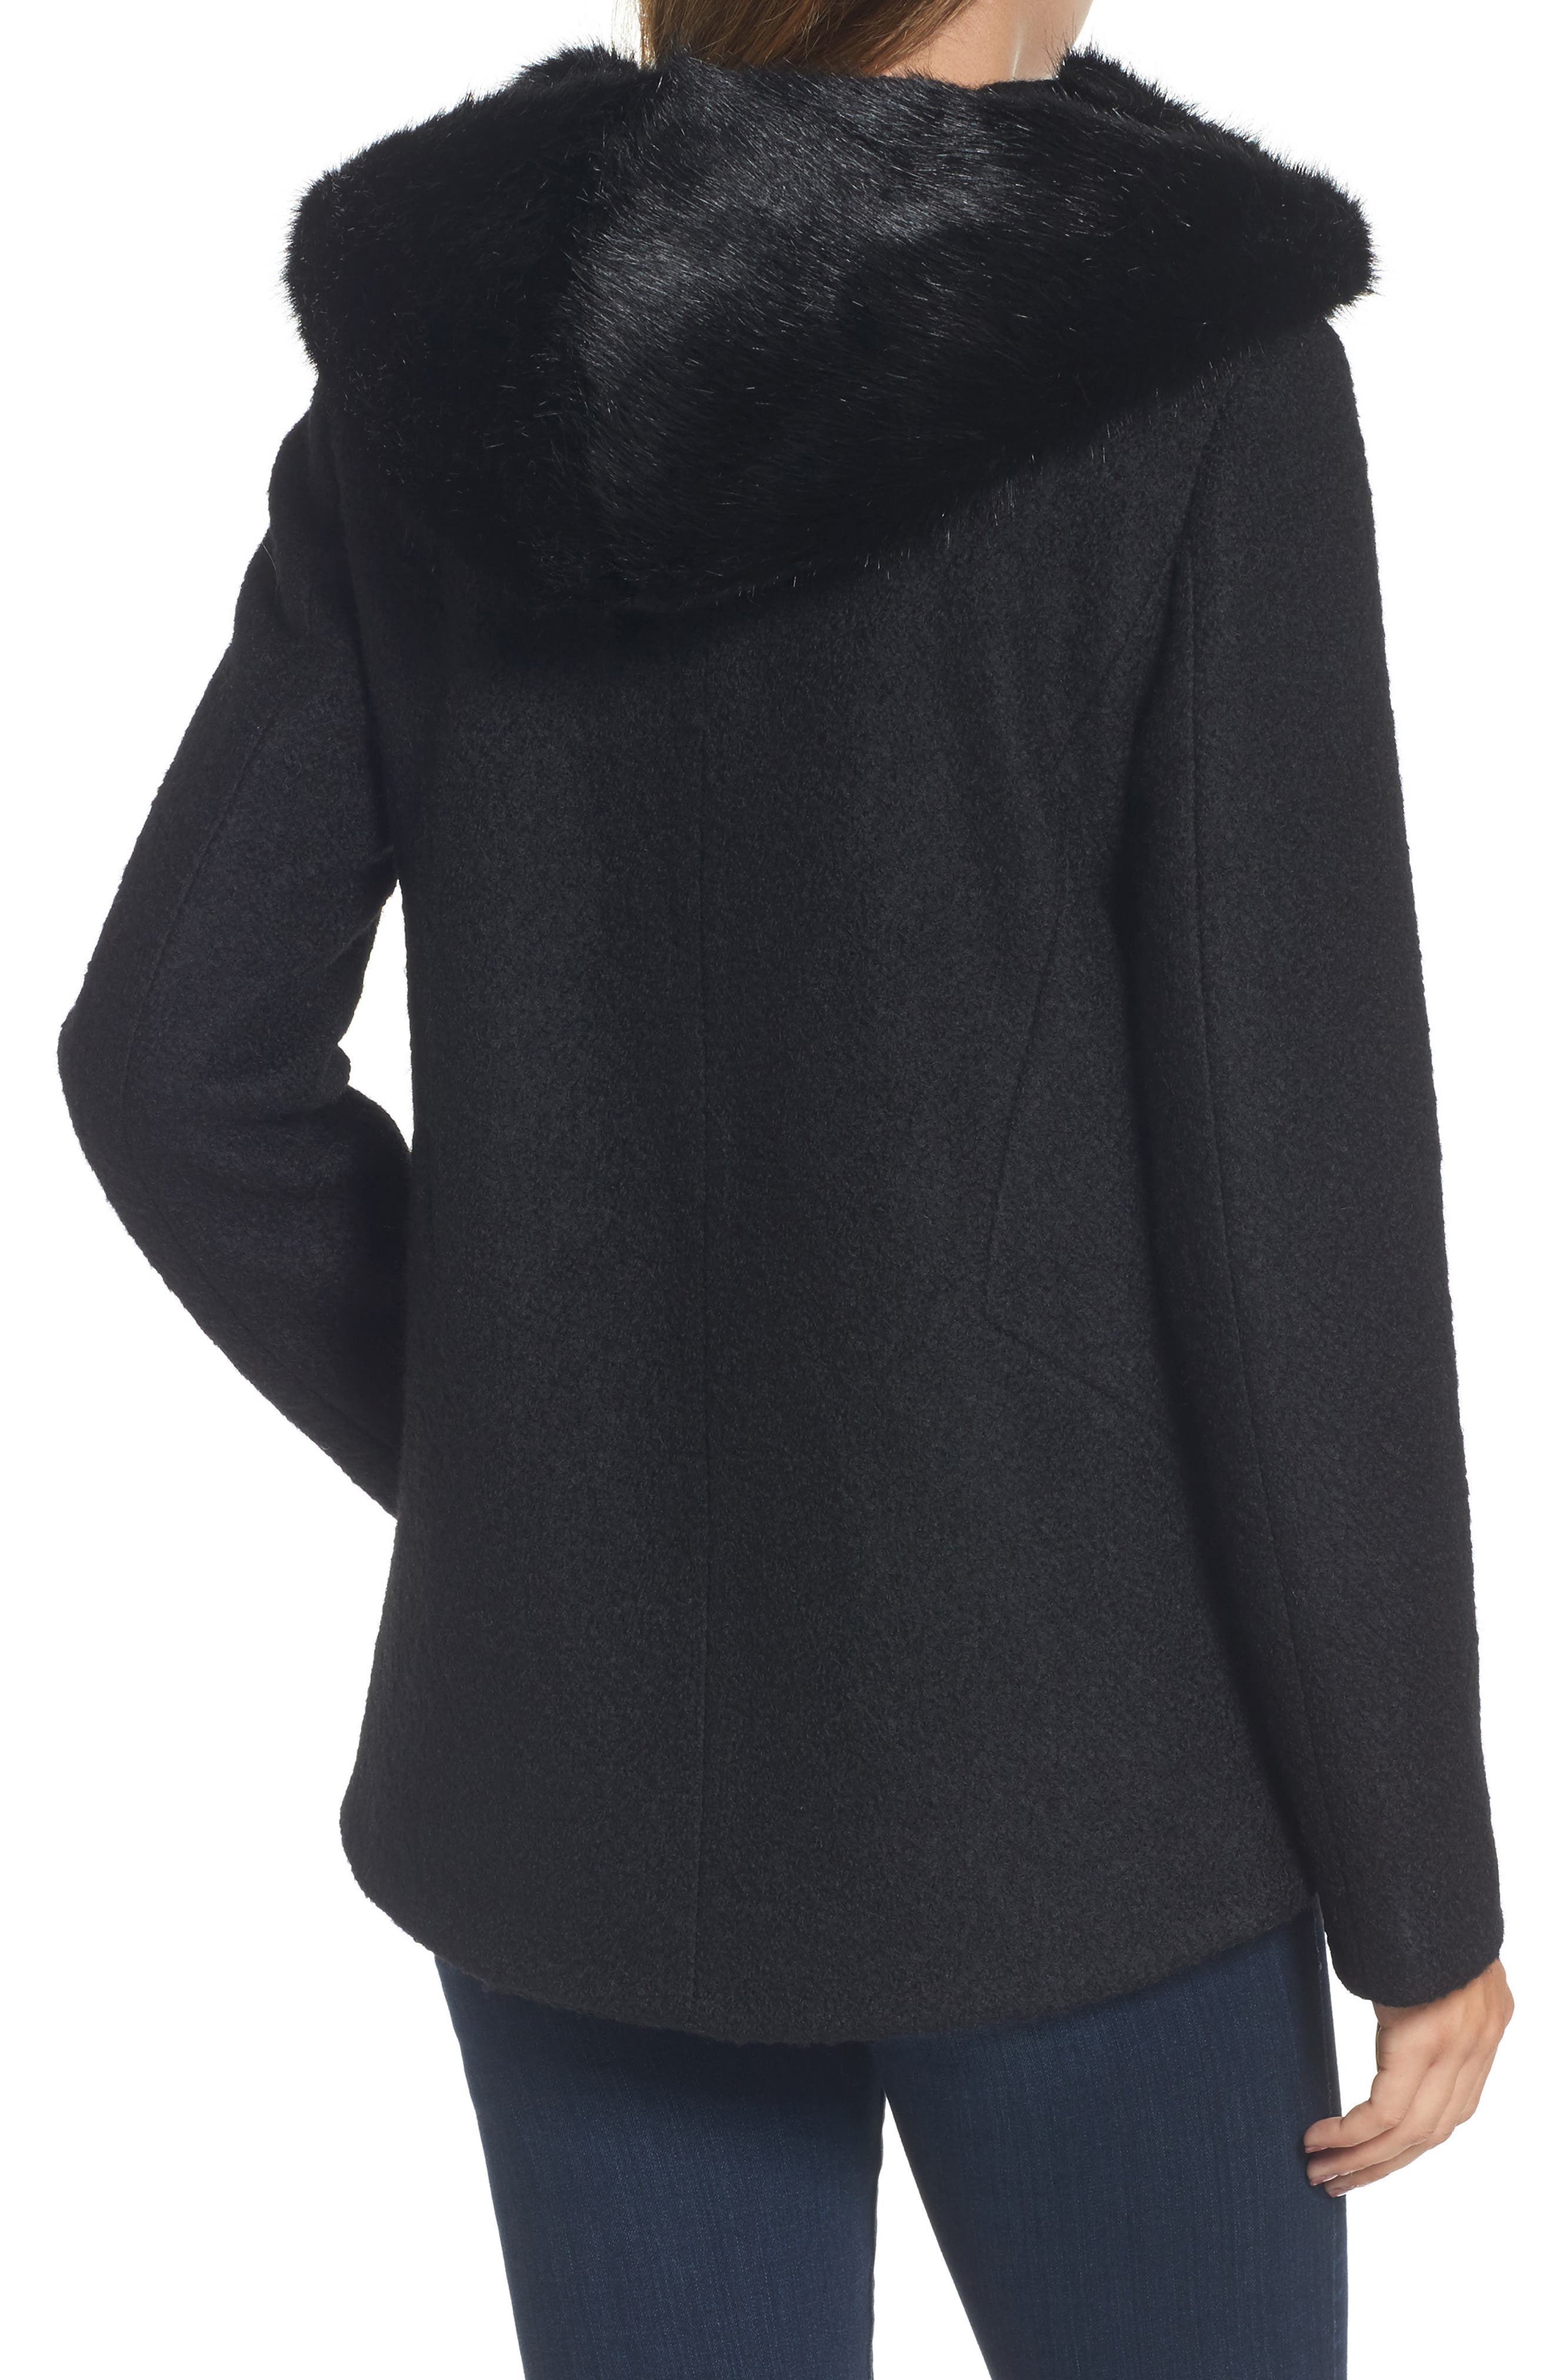 Hooded Wool Blend Bouclé Jacket with Faux Fur Trim,                             Alternate thumbnail 2, color,                             001